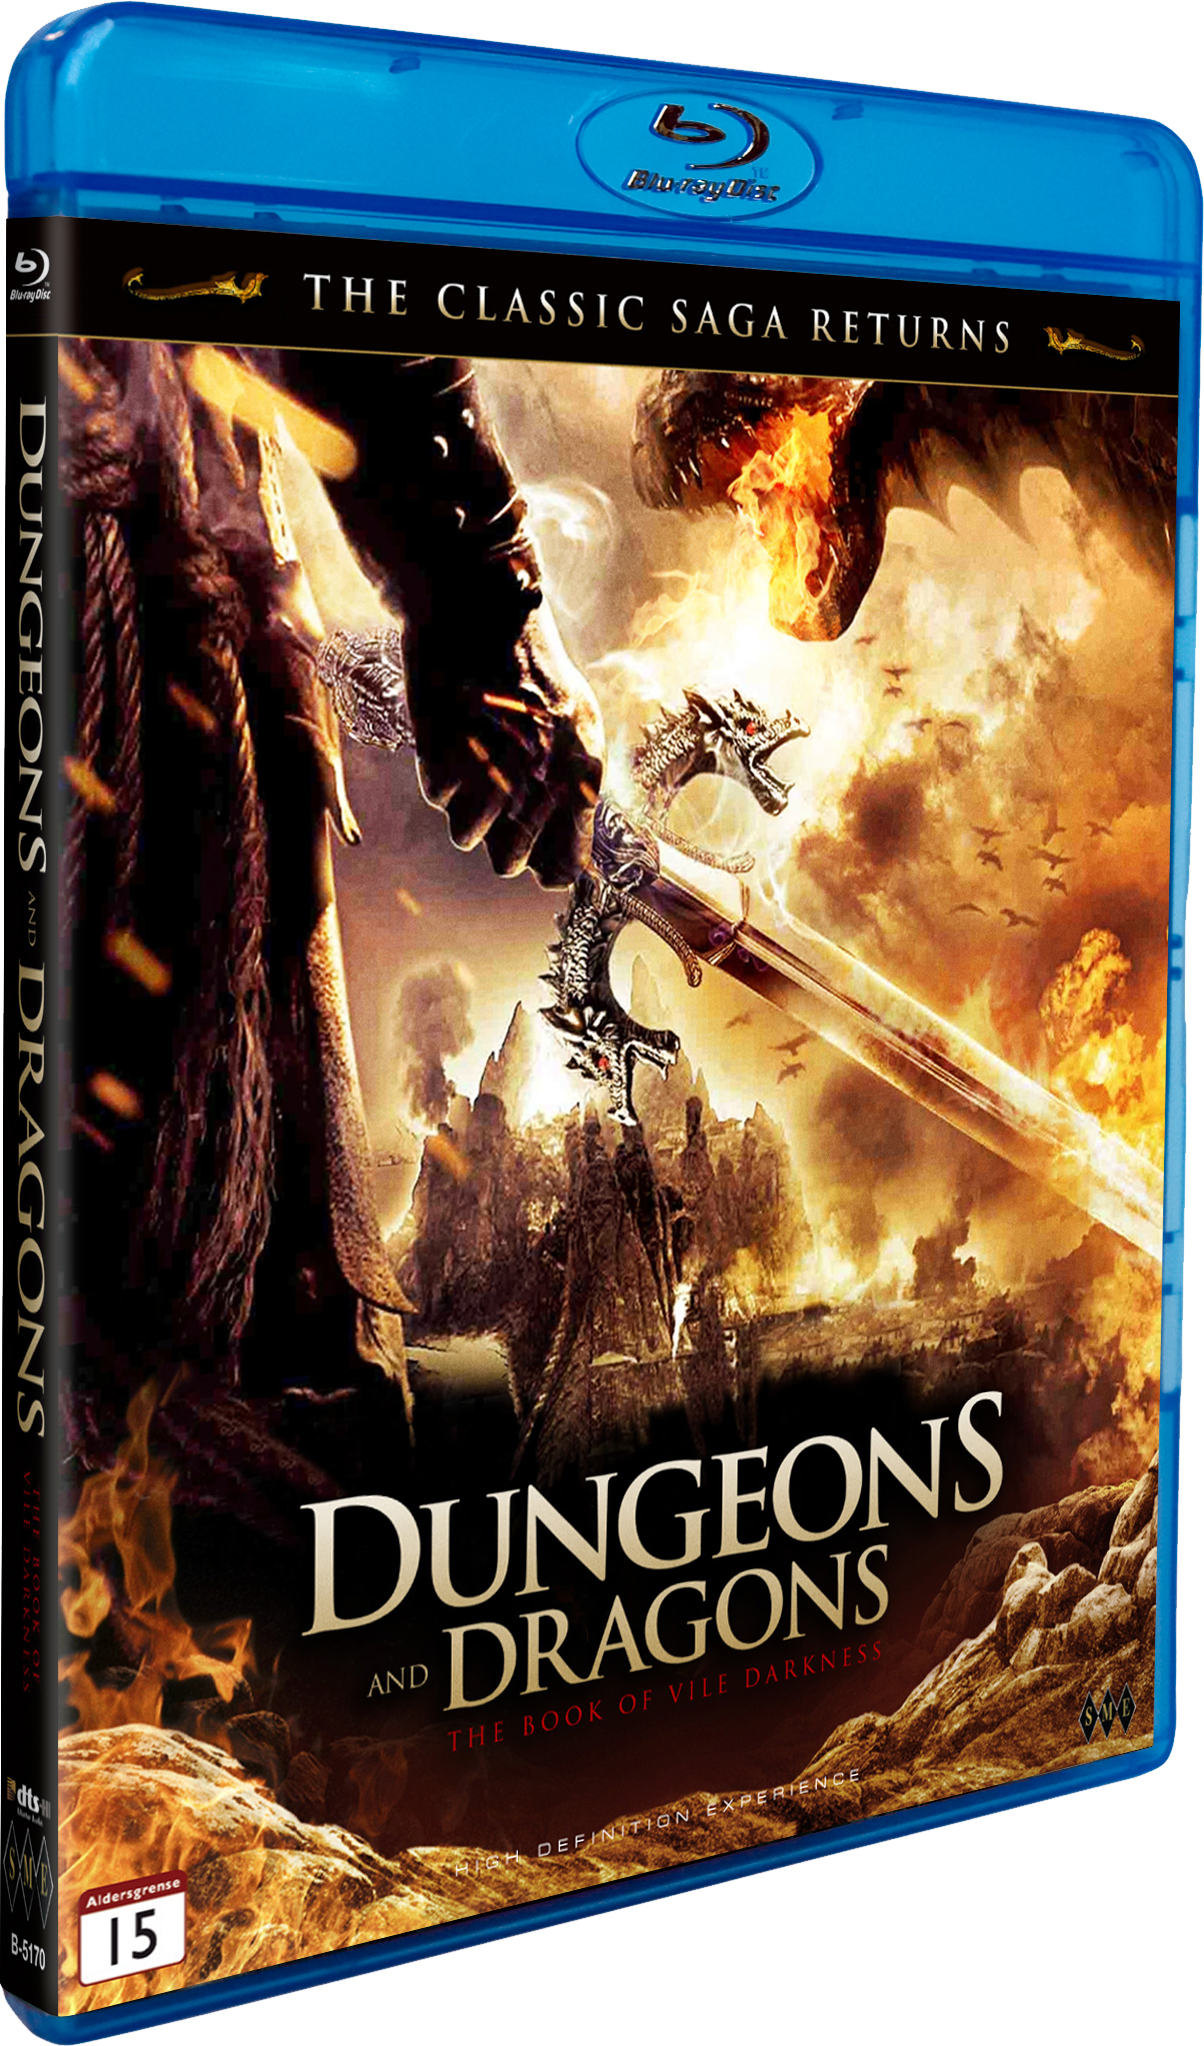 Dungeons & Dragons (film series) - Wikipedia